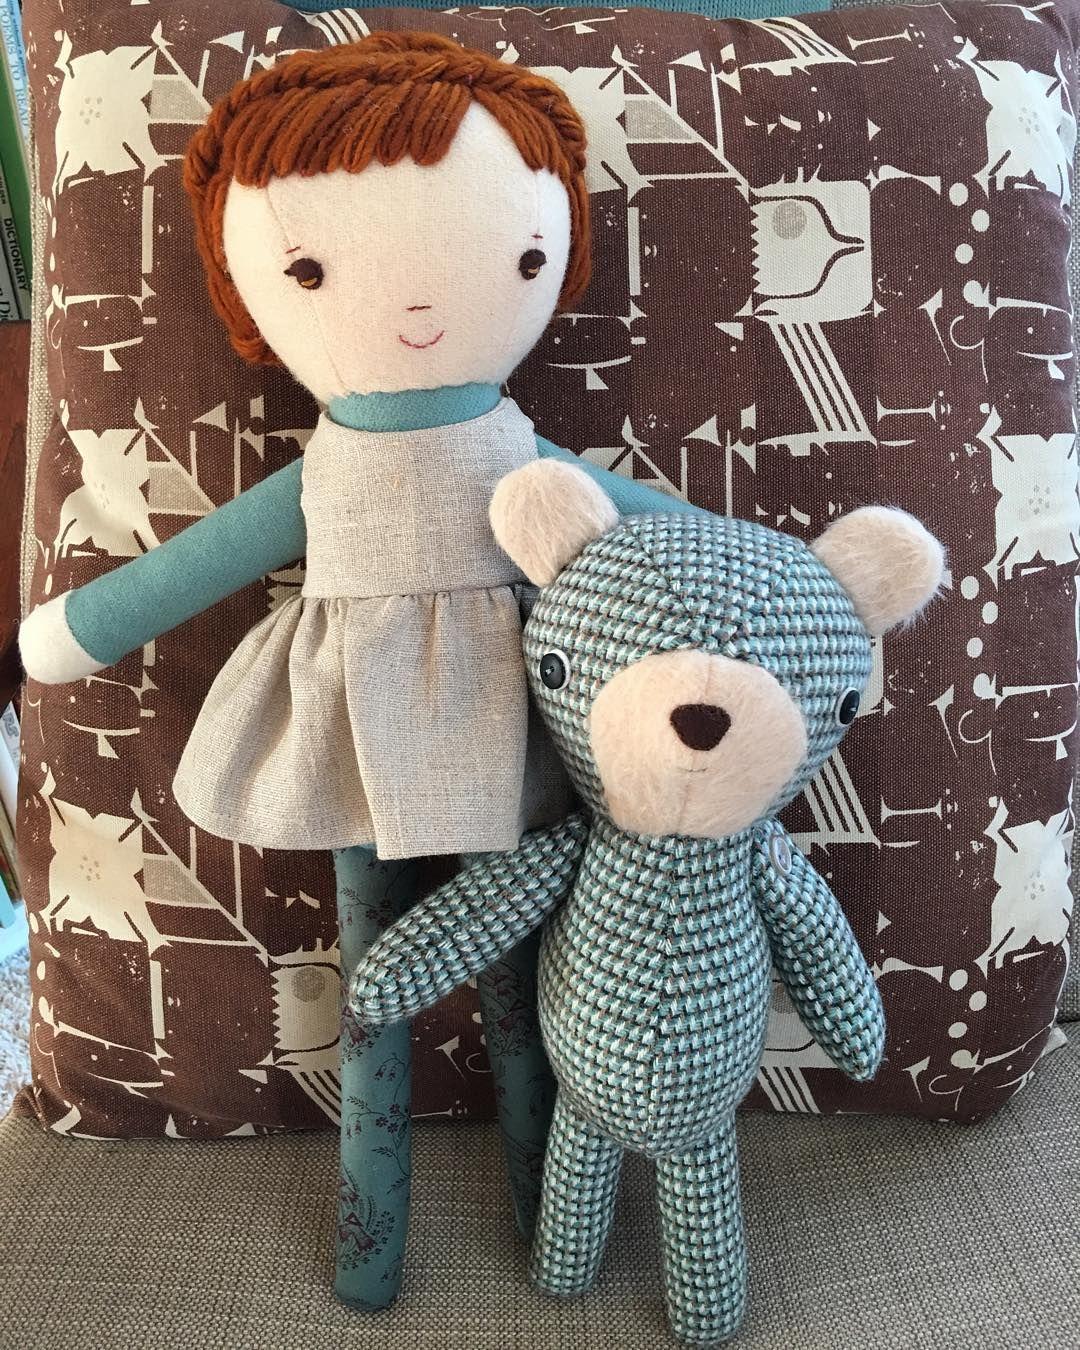 Handmade dolls and sewing patterns at wee wonderfuls wee handmade dolls and sewing patterns at wee wonderfuls jeuxipadfo Choice Image